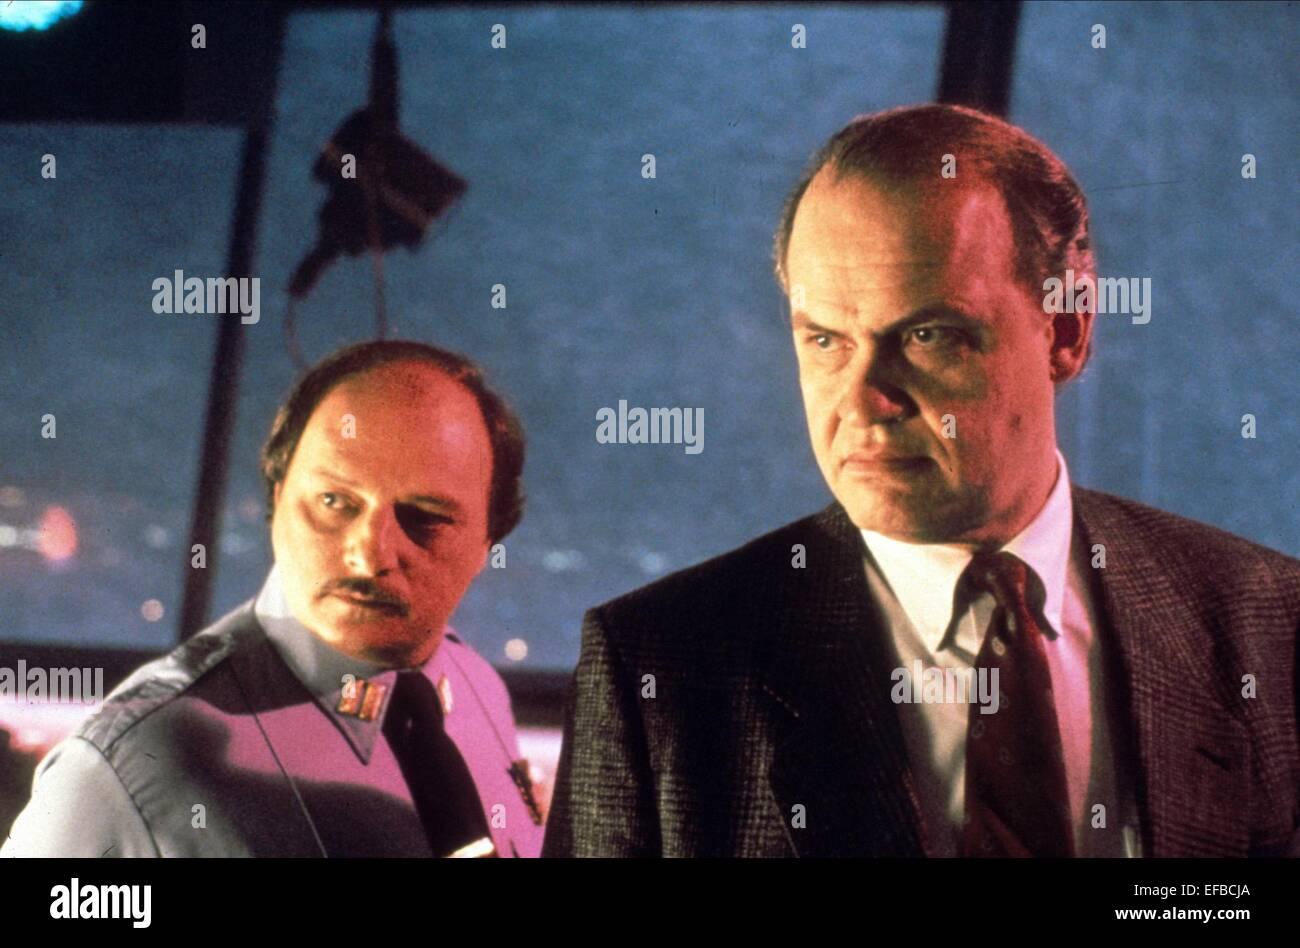 Dennis Franz Fred Dalton Thompson Die Hard 2 1990 Stock Photo Alamy